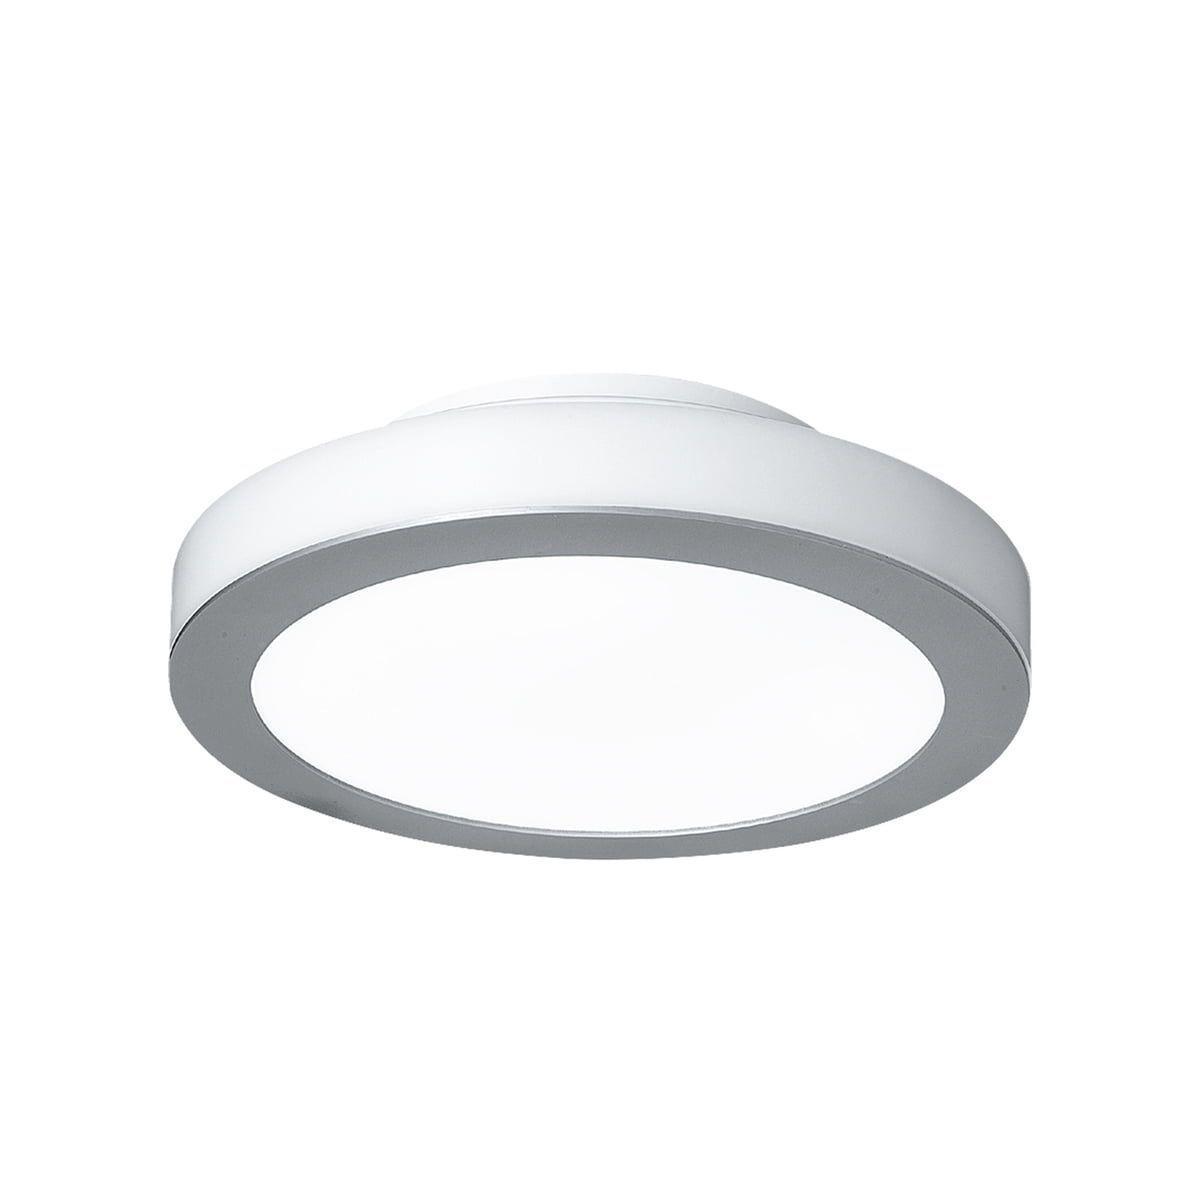 Io Perete Plafon Aluminium Ring